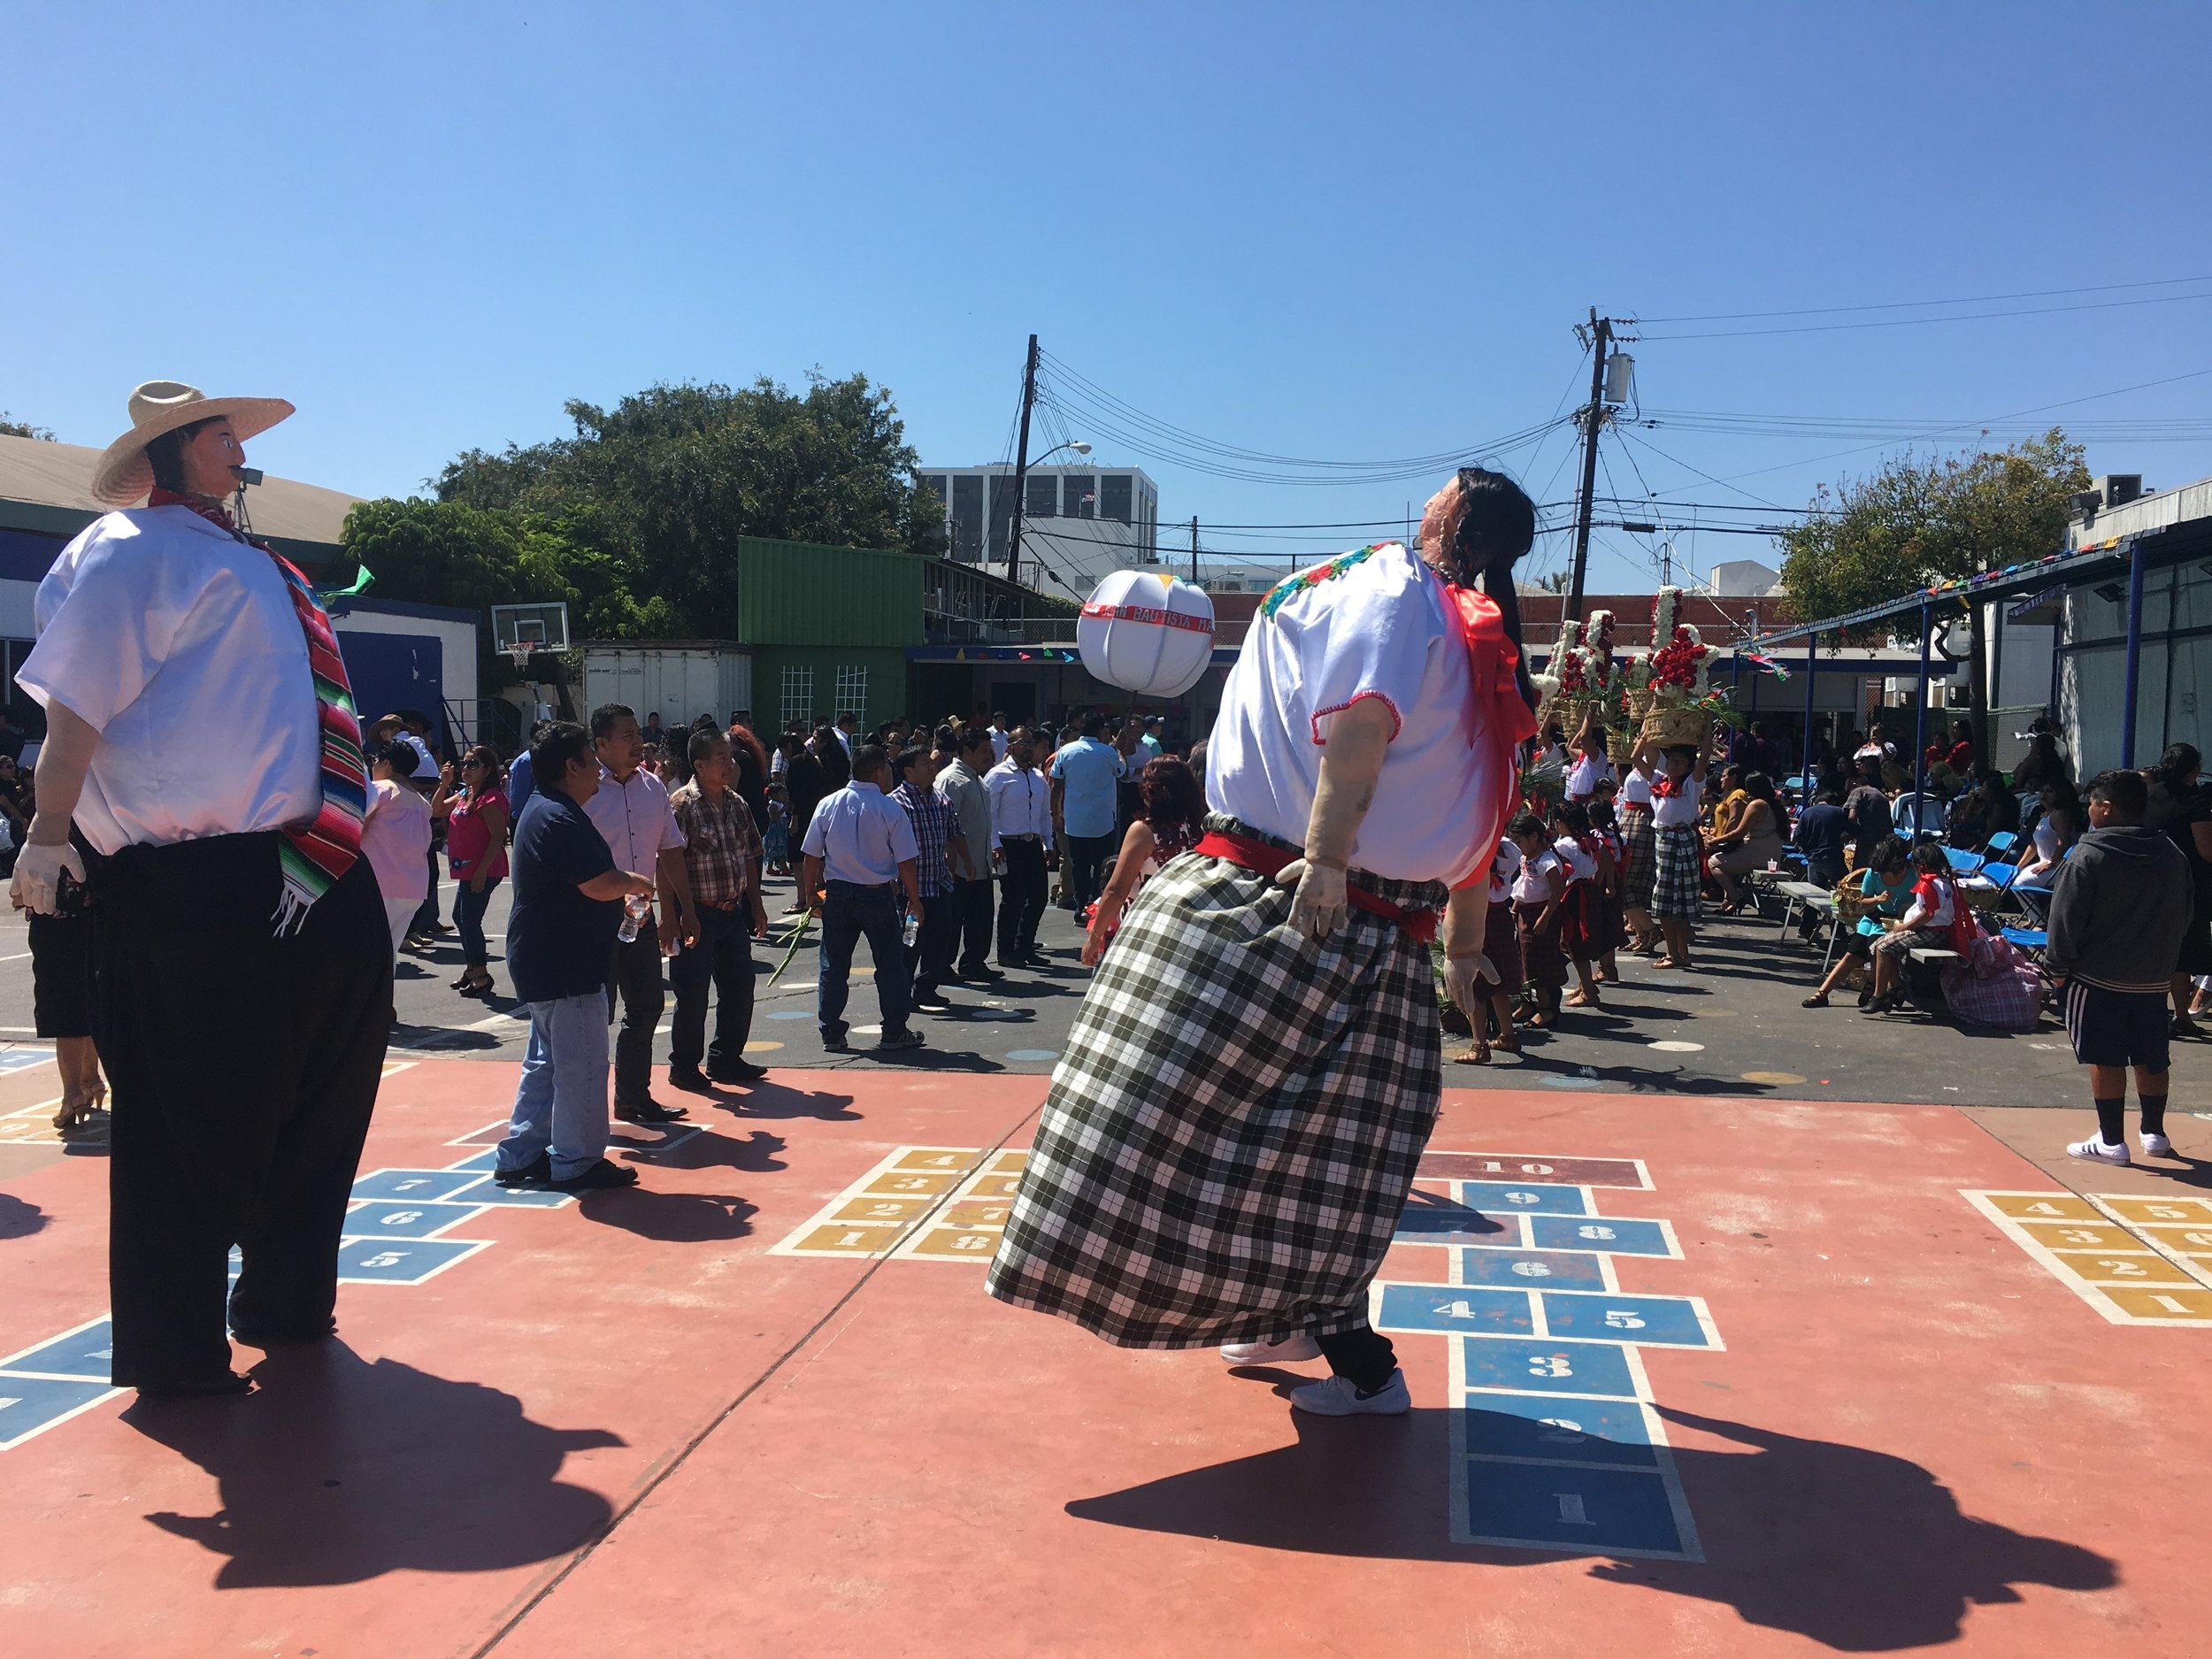 Oaxaca Brass Band and Traditional Festival in LA - Balkan-sounding Mexican Tambora Oaxaqueña in Santa Monica for a religious festival